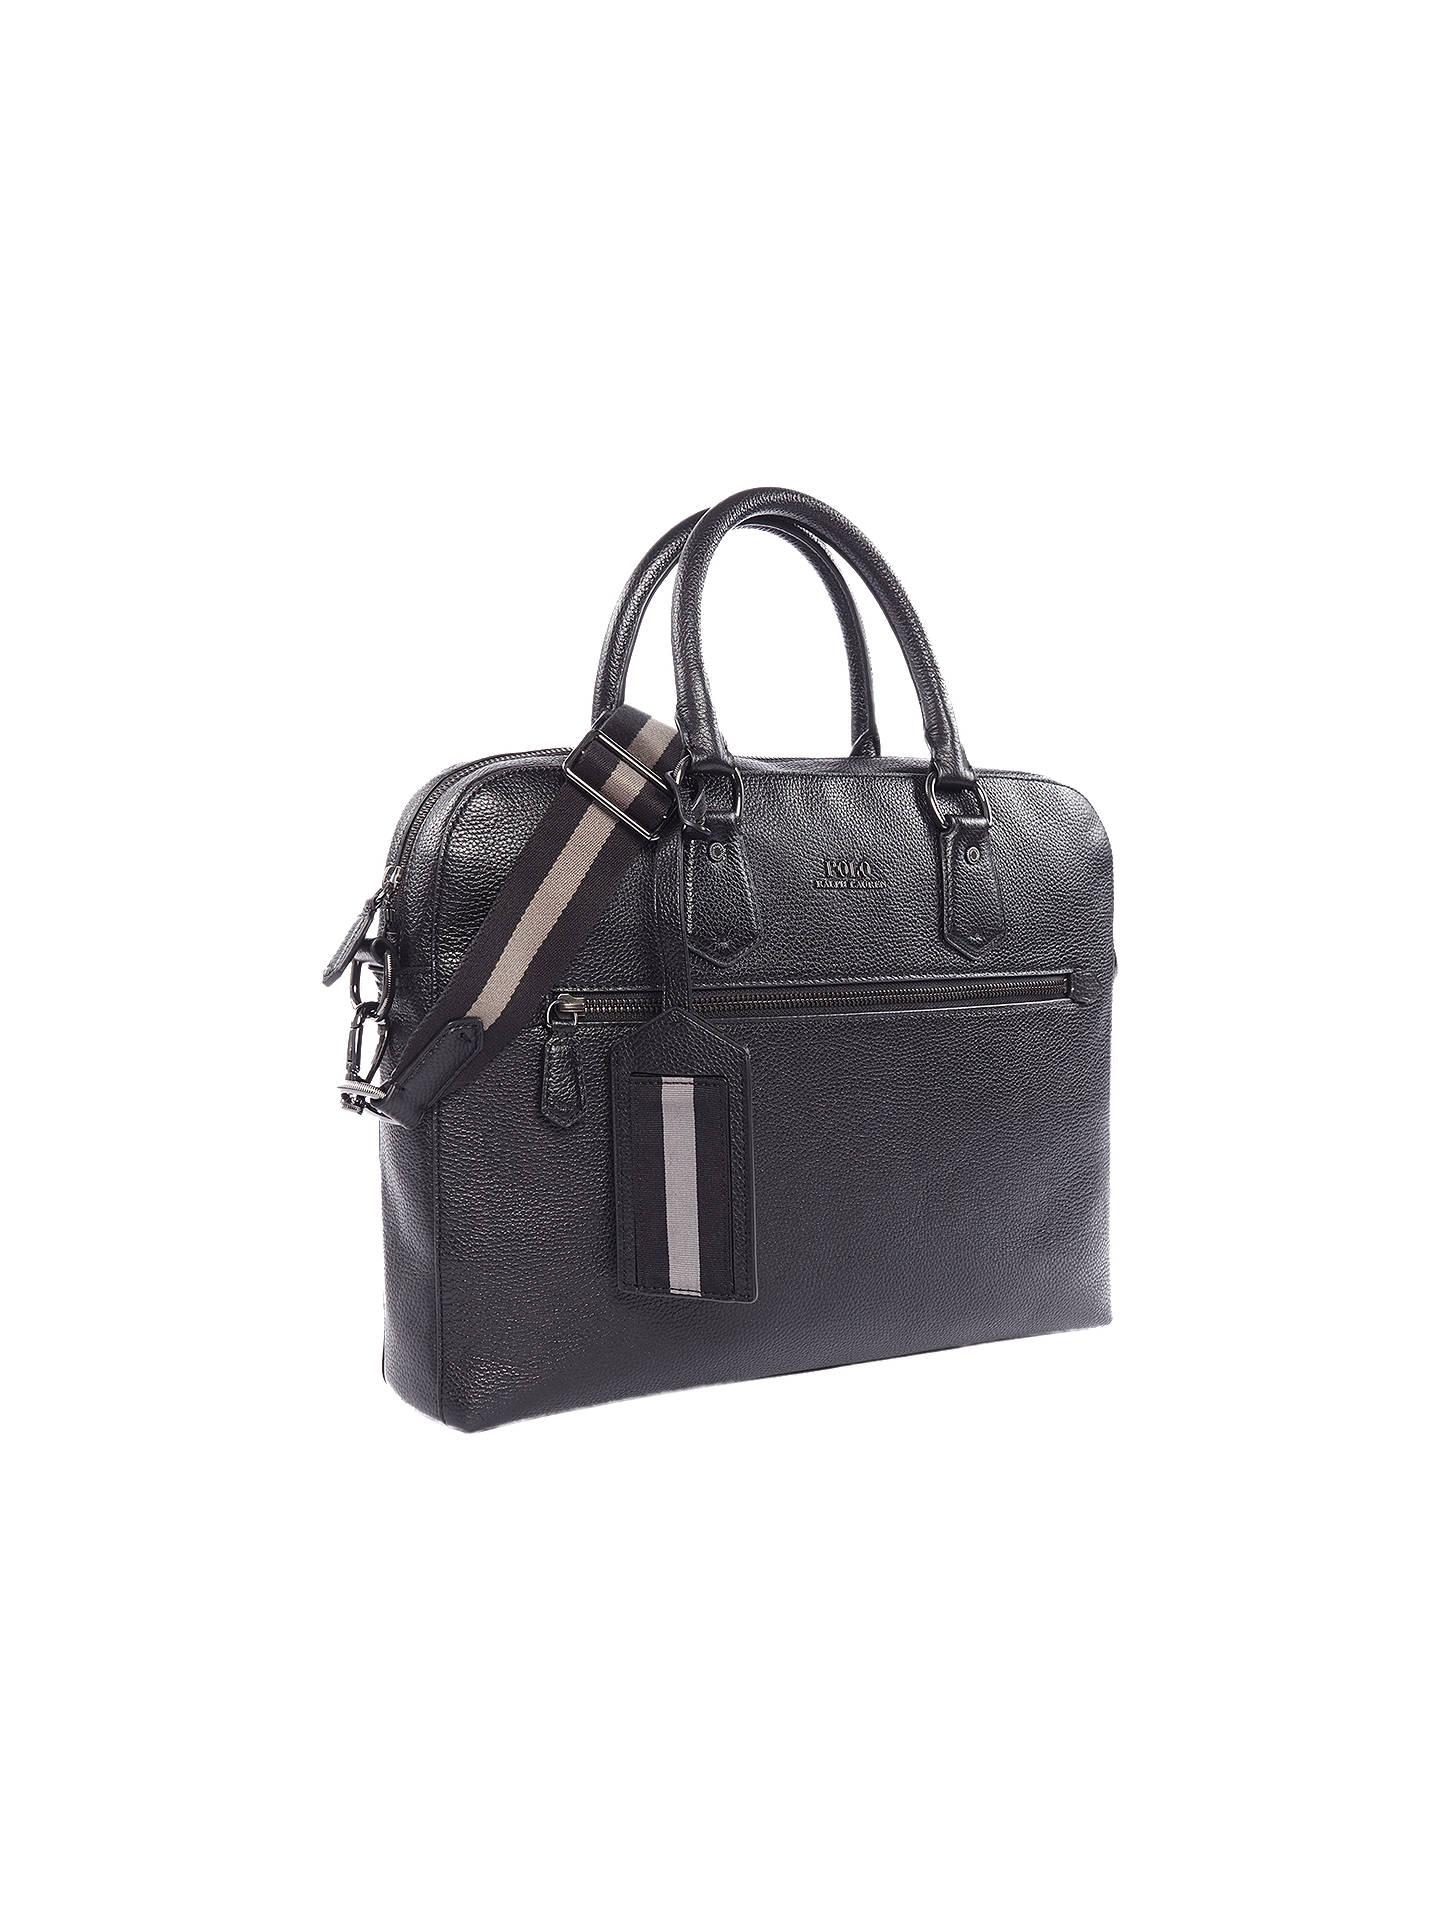 081c1880564c BuyPolo Ralph Lauren Leather Briefcase